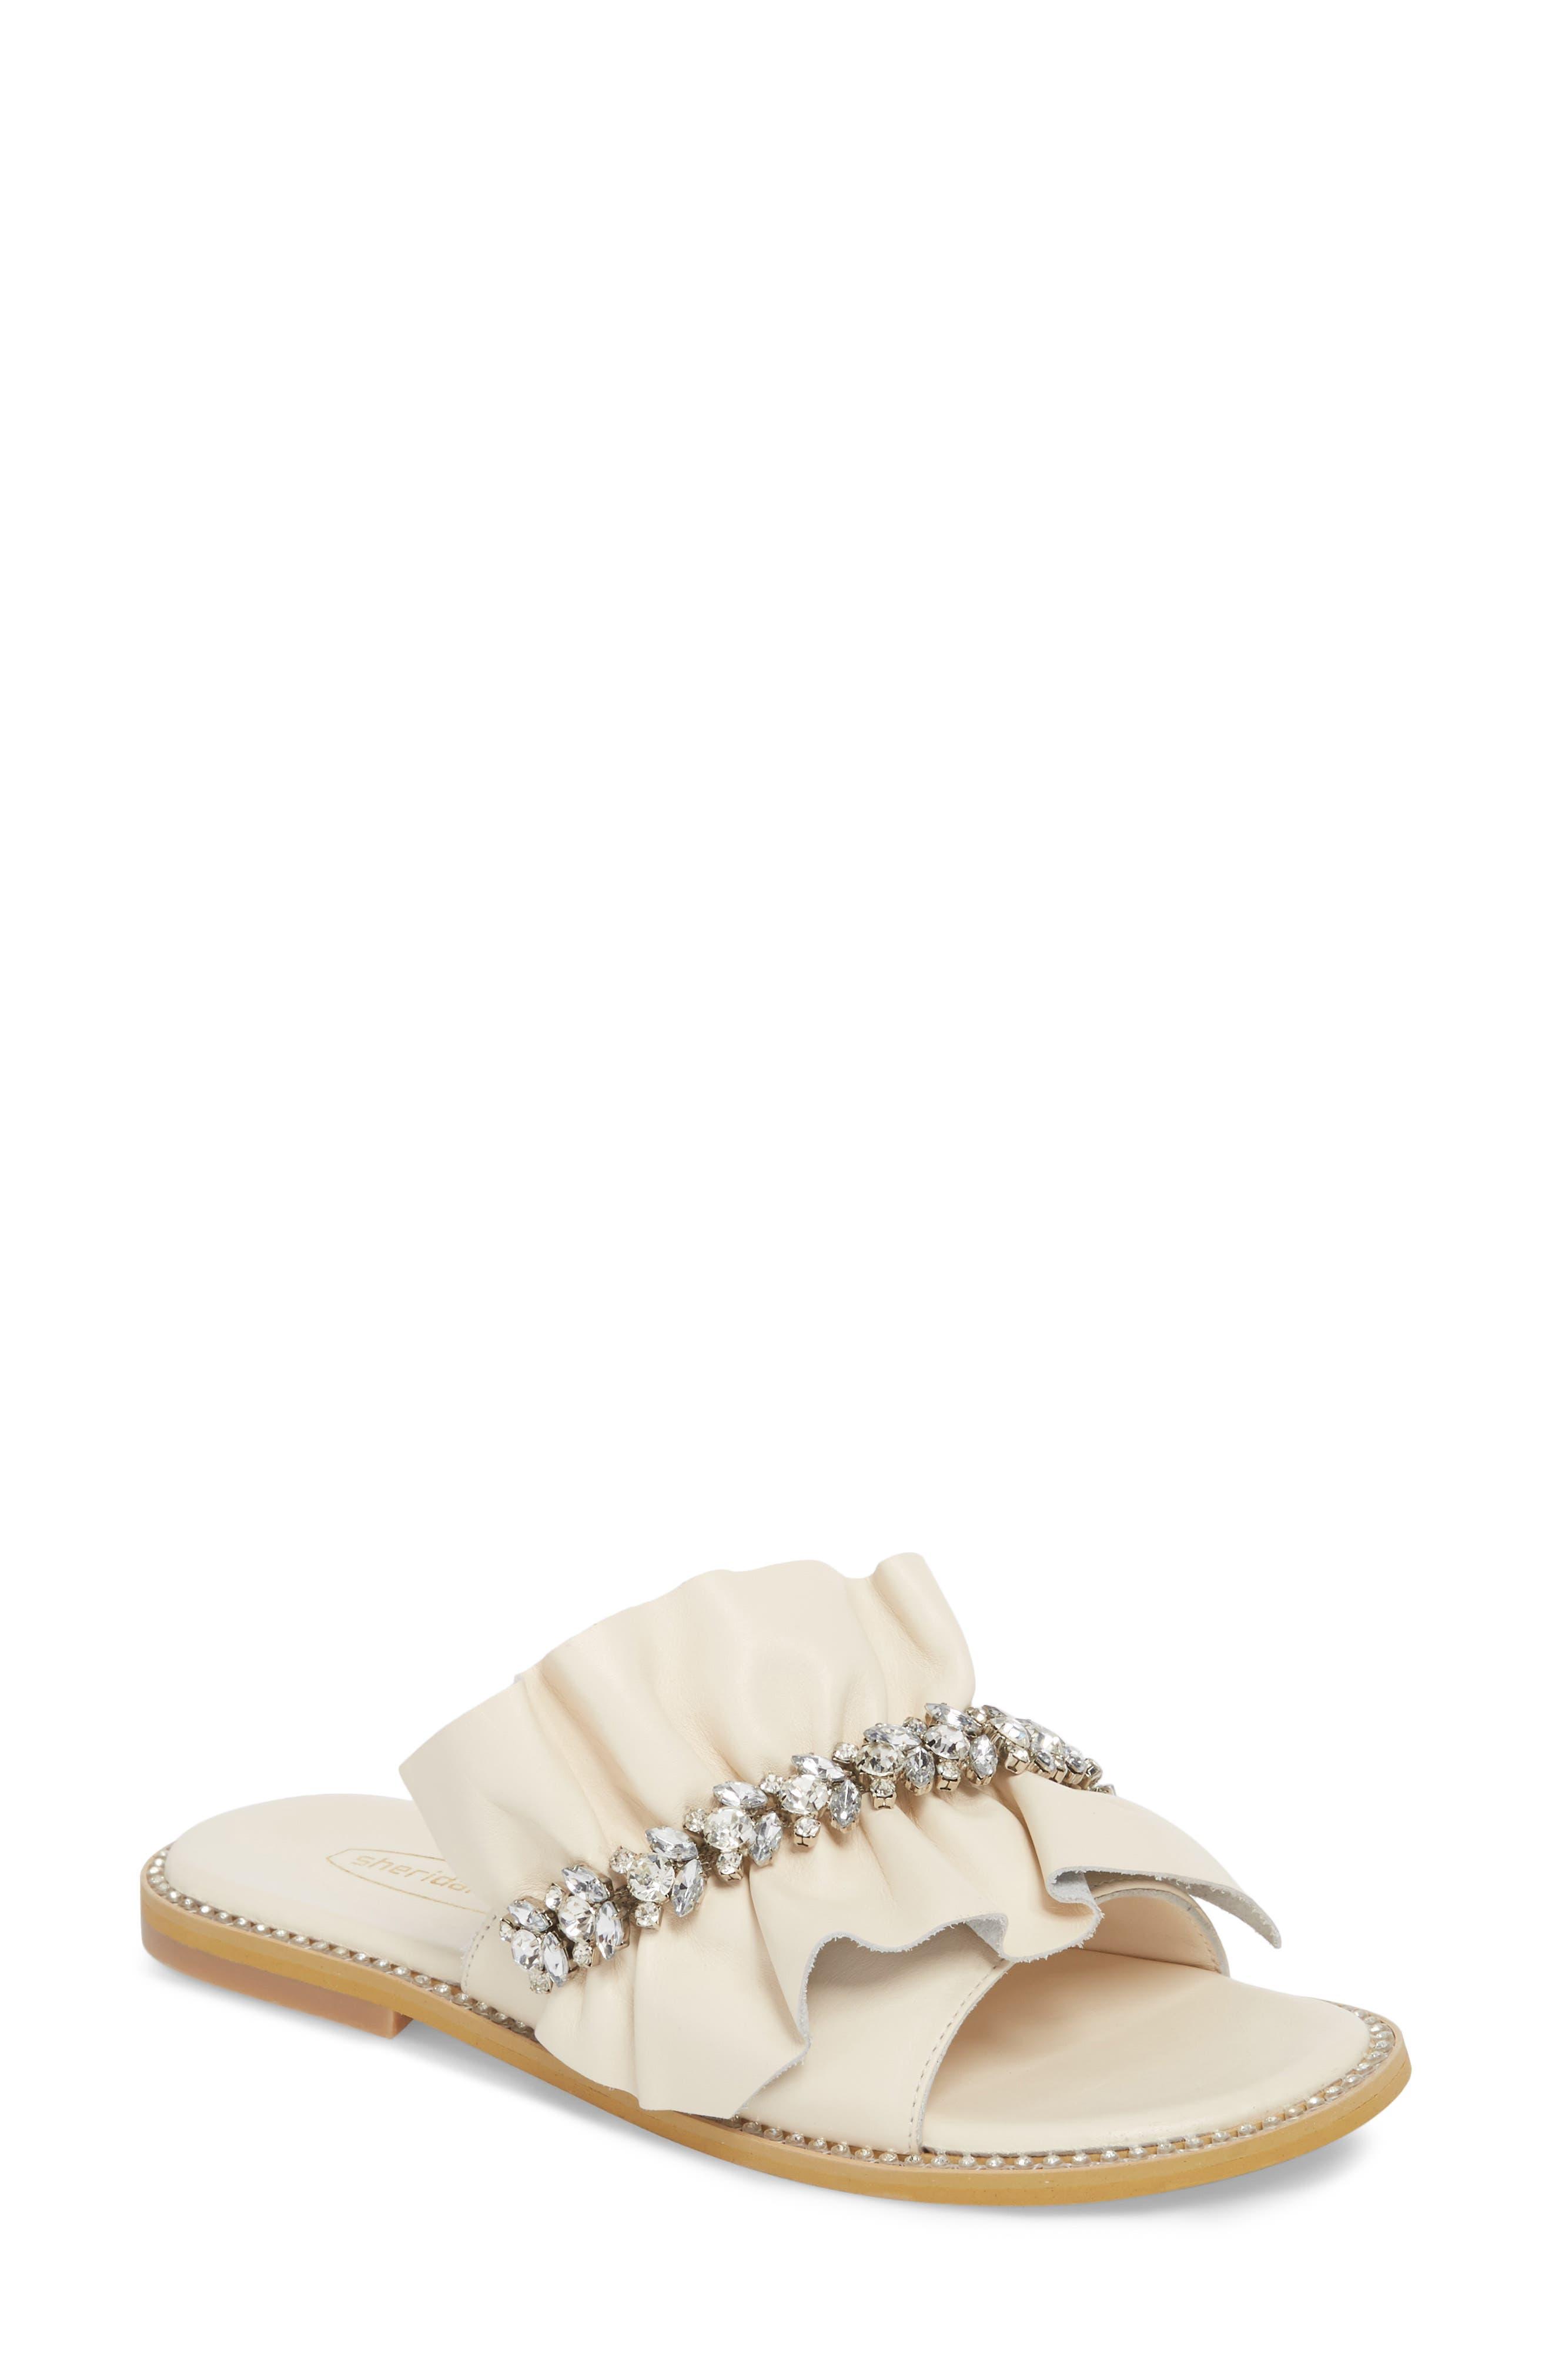 Tiana Crystal Slide Sandal,                         Main,                         color, Cream Leather